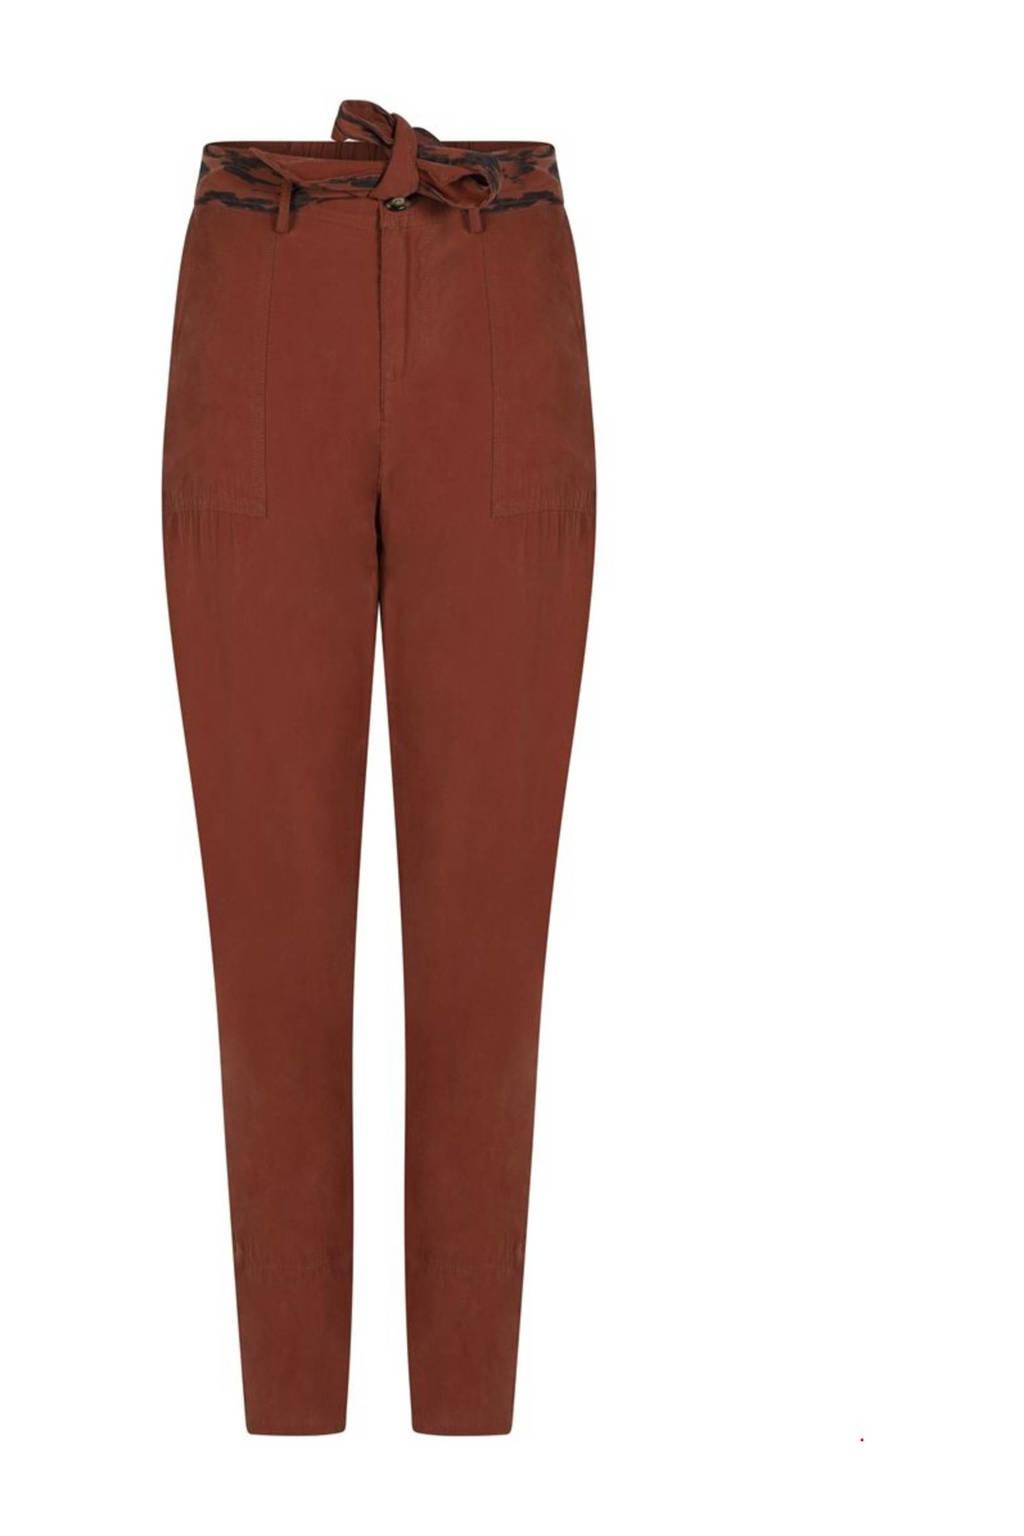 Tramontana high waist tapered fit broek cognac, Cognac